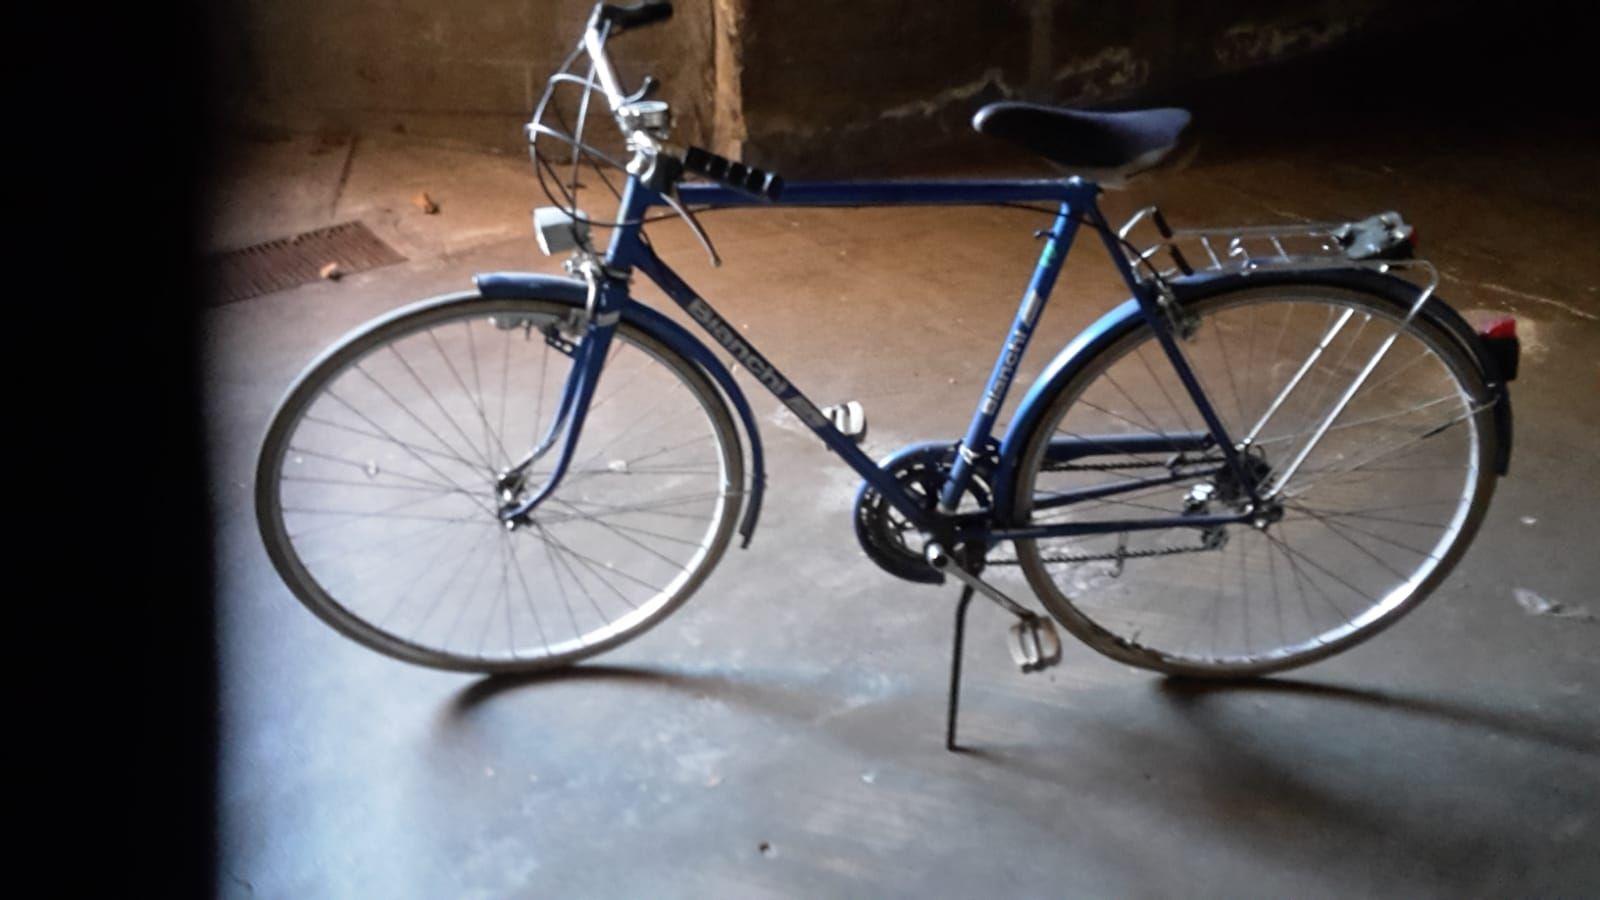 Bicicletta Bianchi Vintage, Spluga 10 V.